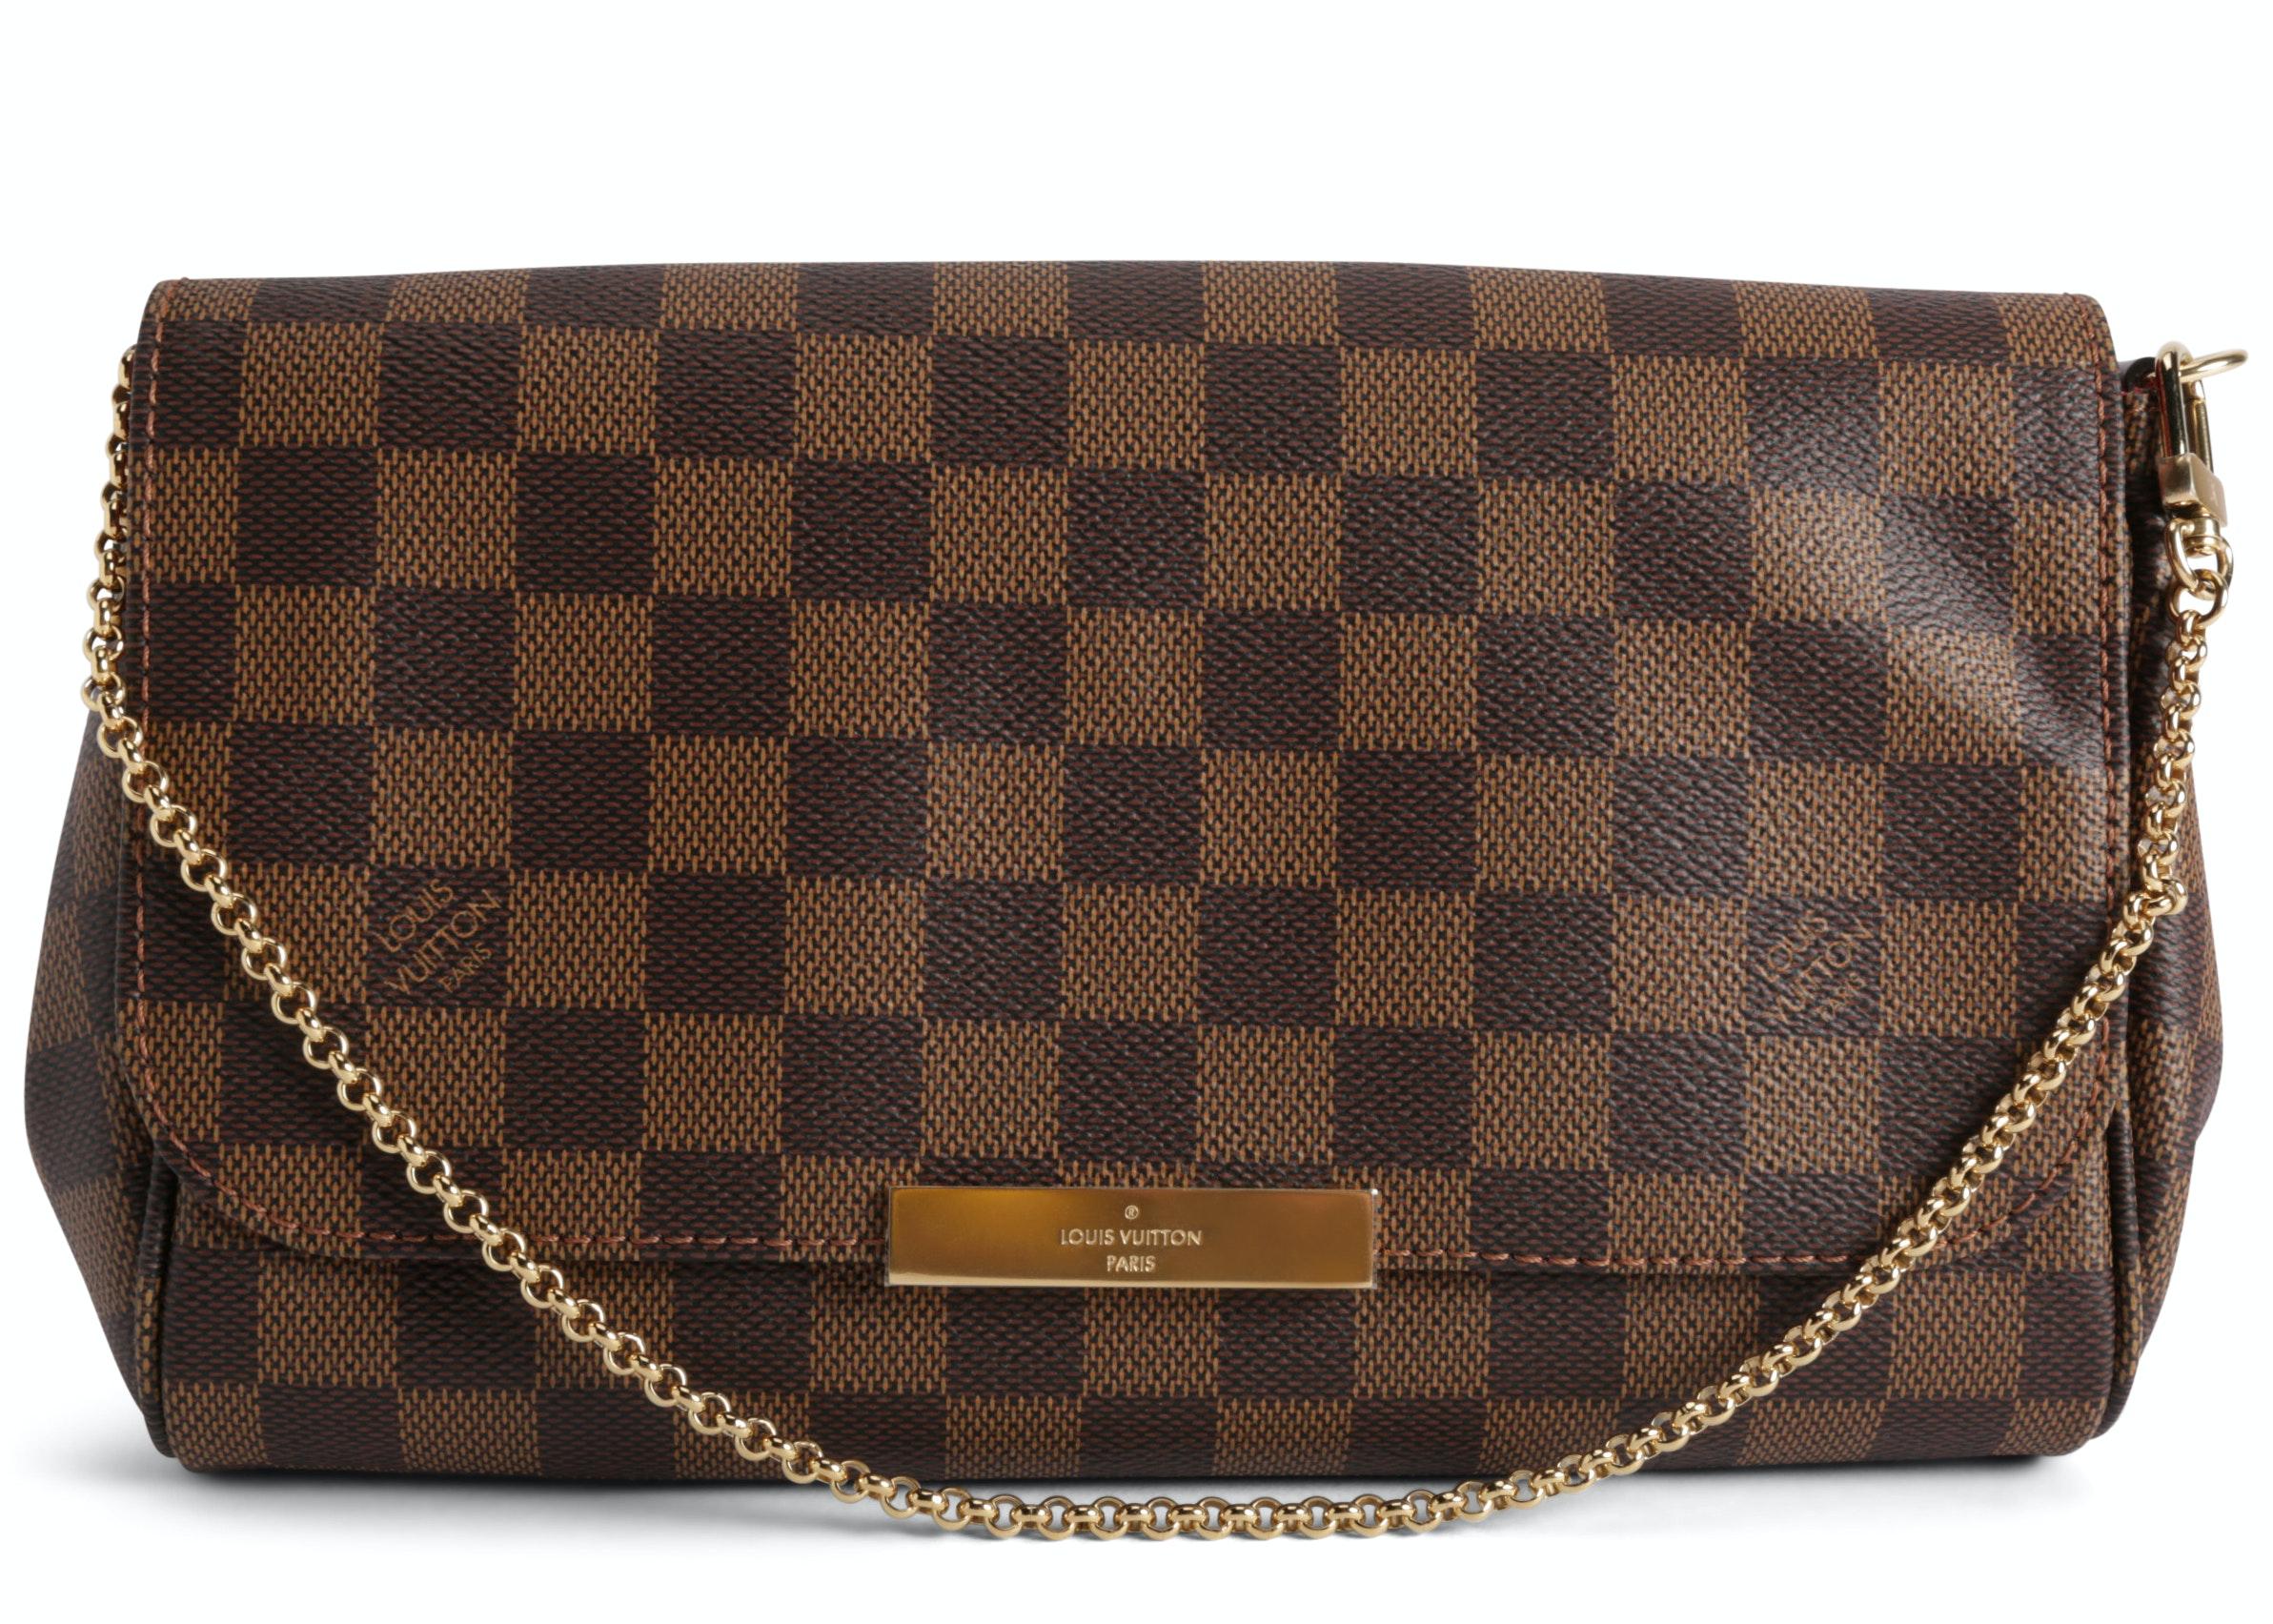 Louis Vuitton Favorite Damier Ebene MM Brown